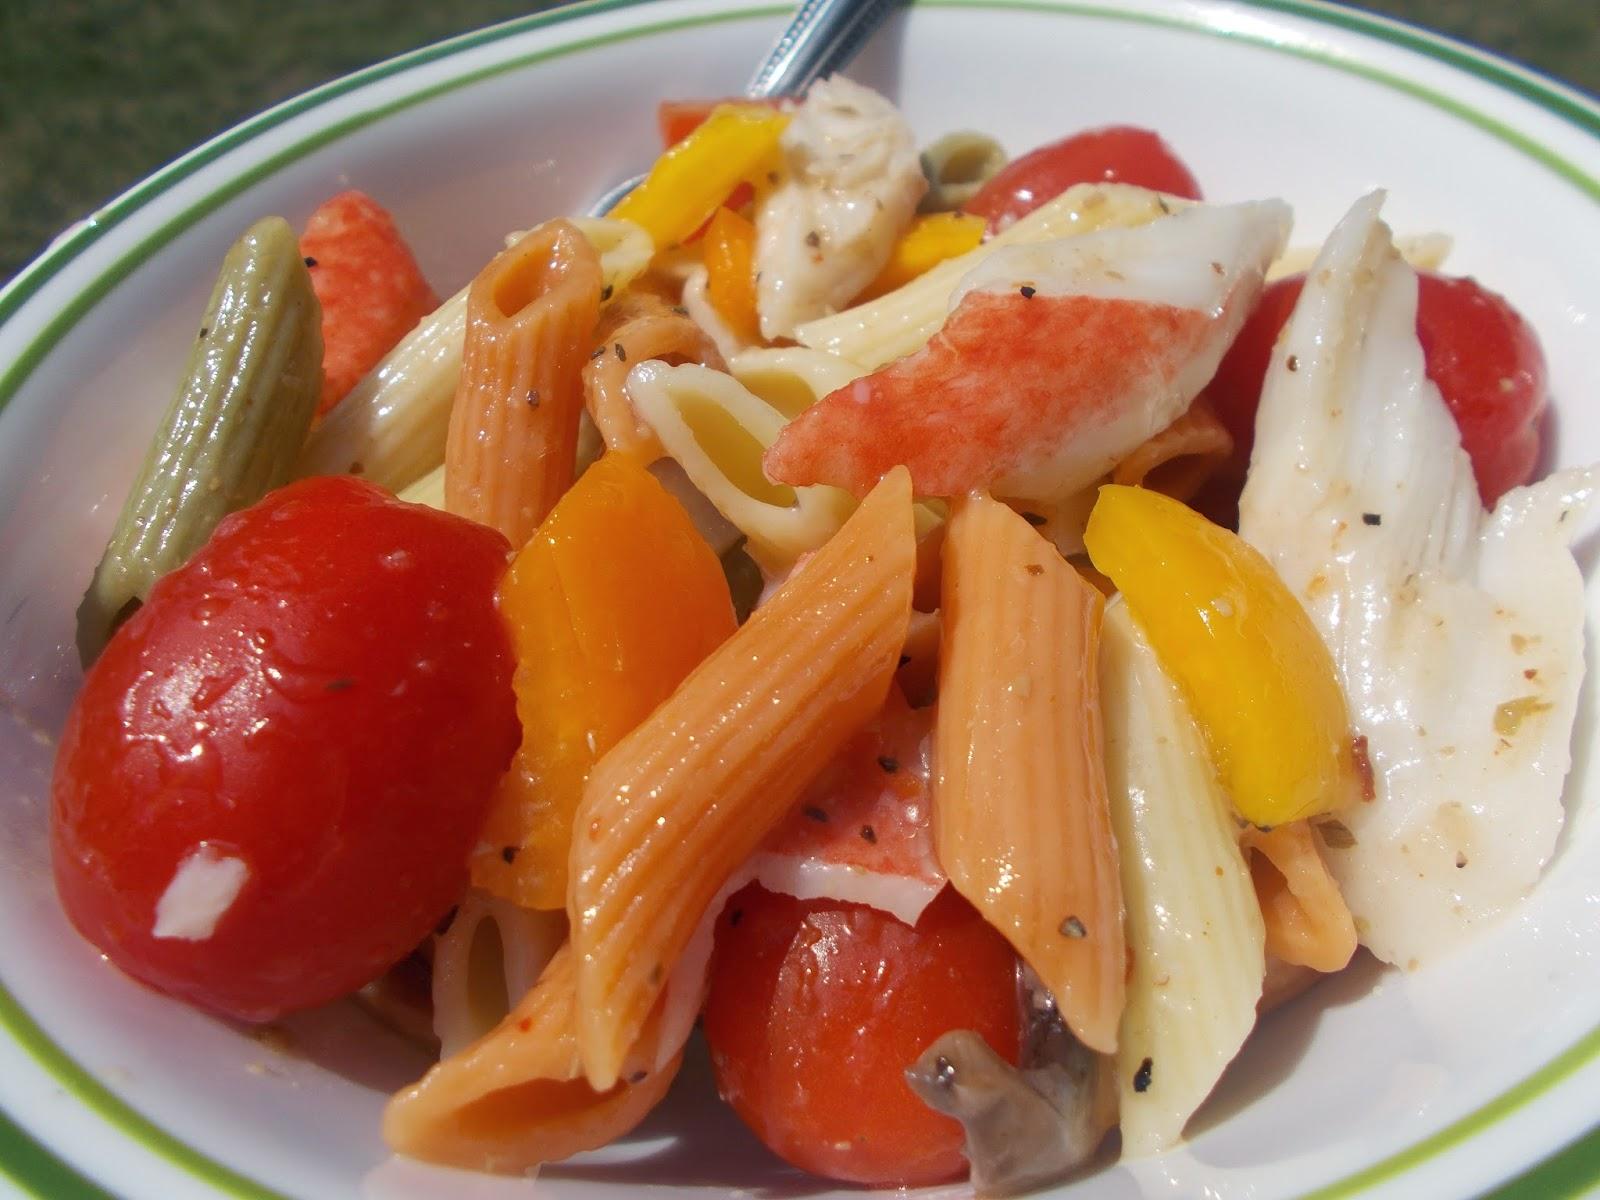 http://sarahrosessupposes.blogspot.com/2014/06/summer-seafood-pasta-salad.html